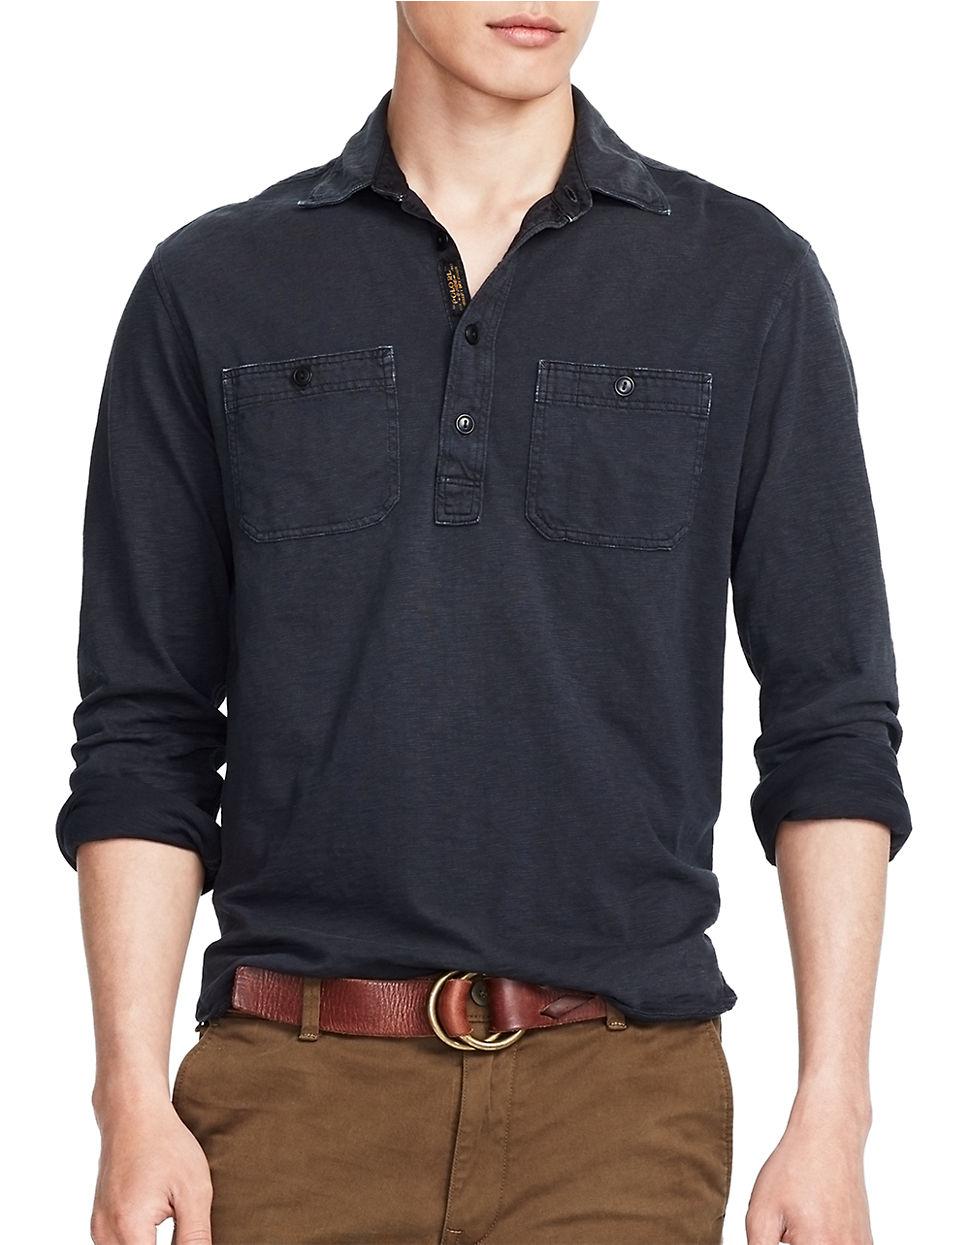 polo ralph lauren jersey pullover sportshirt in black for men lyst. Black Bedroom Furniture Sets. Home Design Ideas